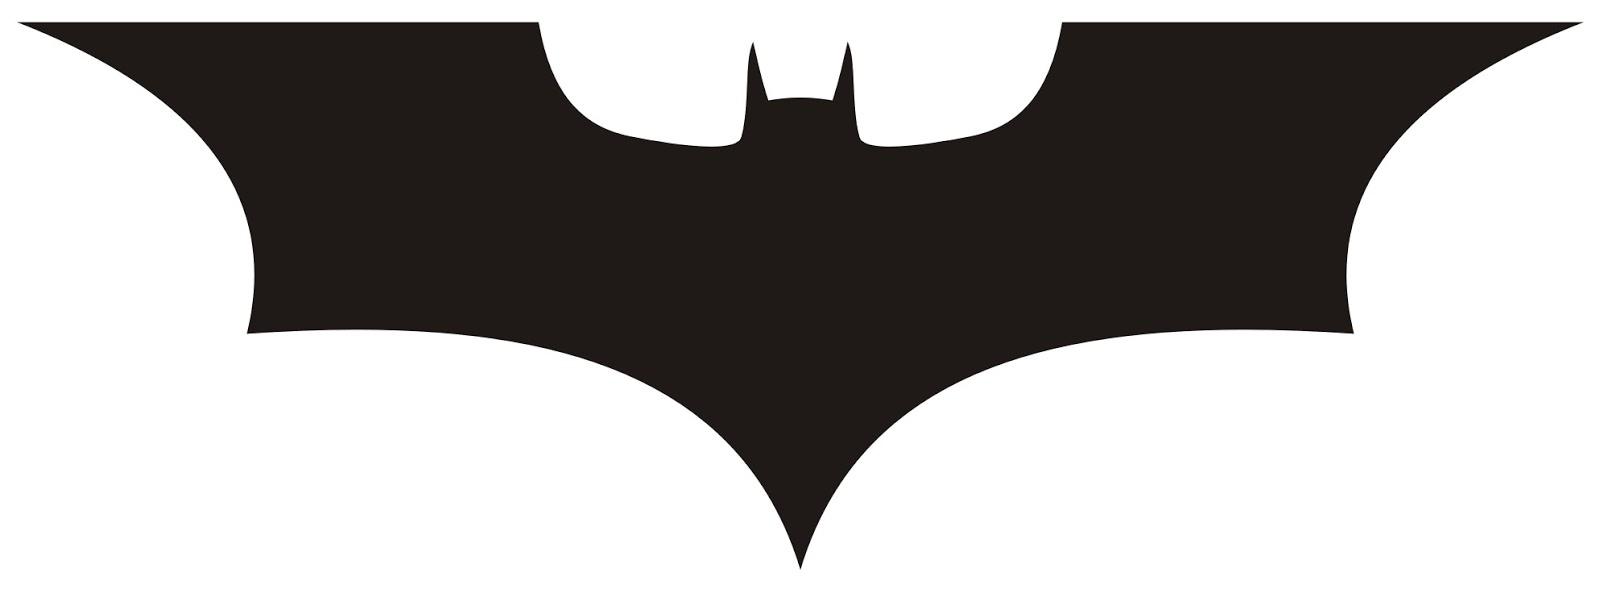 1600x593 Batman Drawing Symbol For Free Download